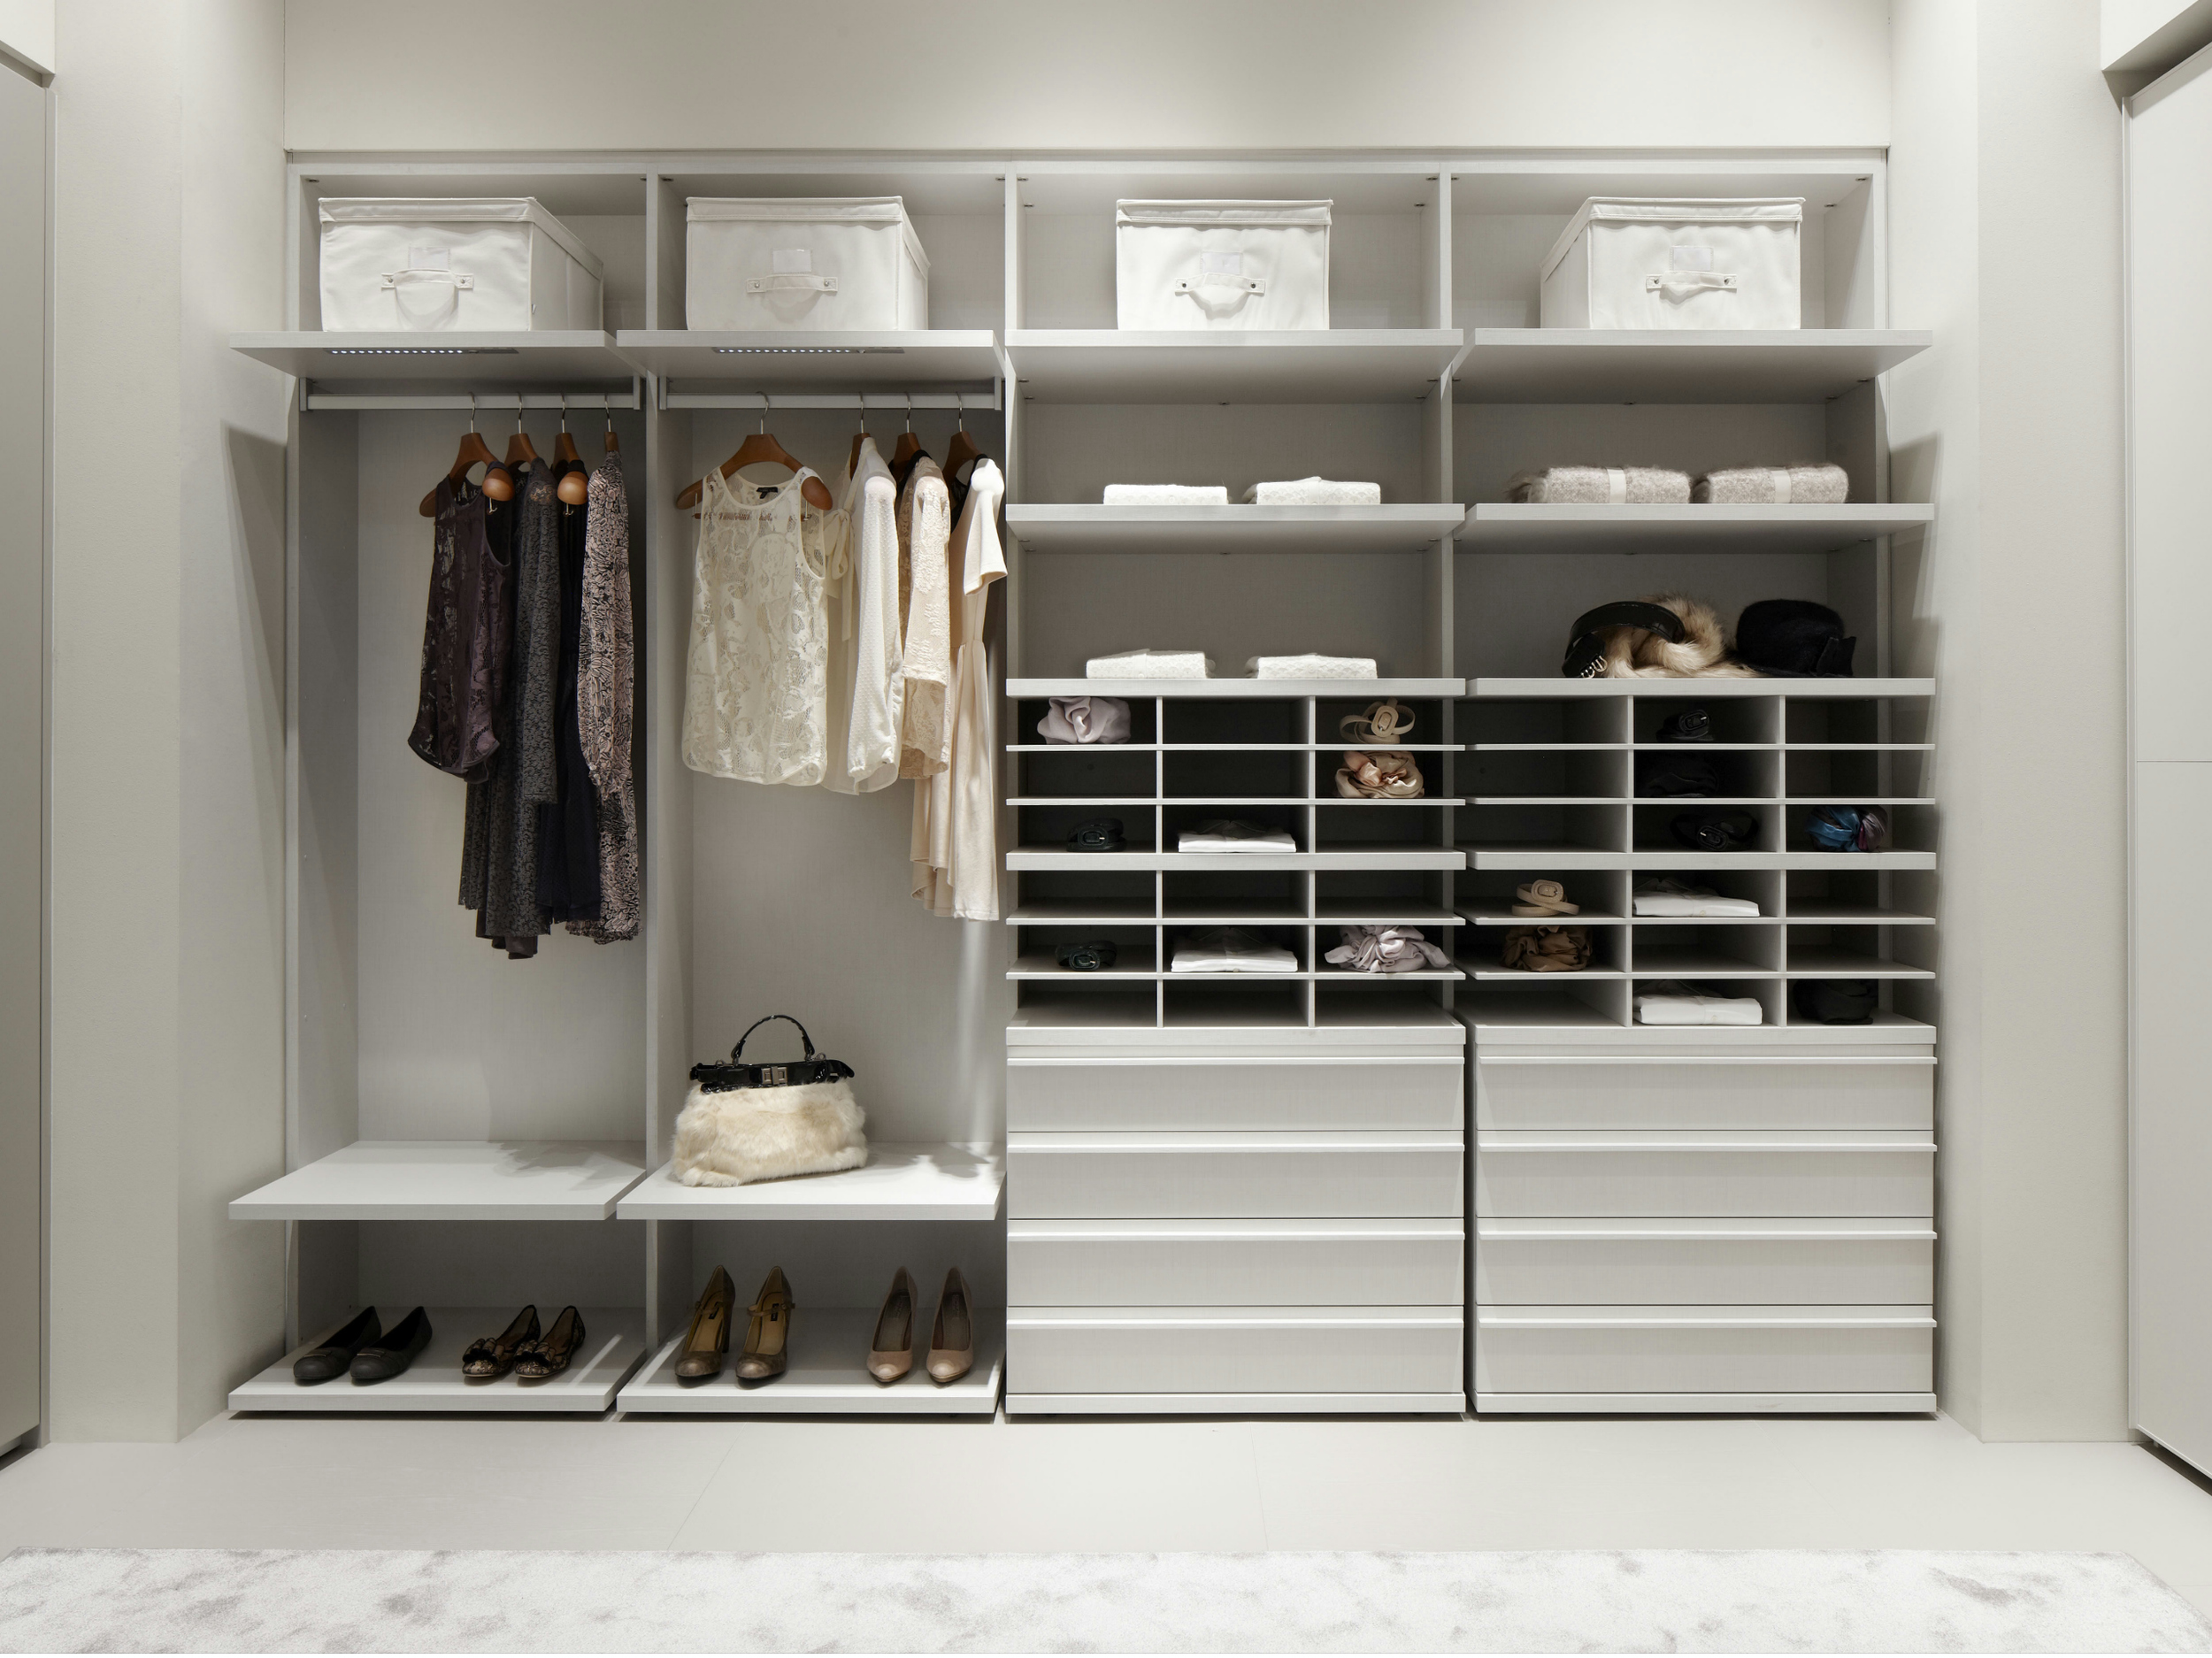 5-luxurious-closet-design-renotalk.jpg